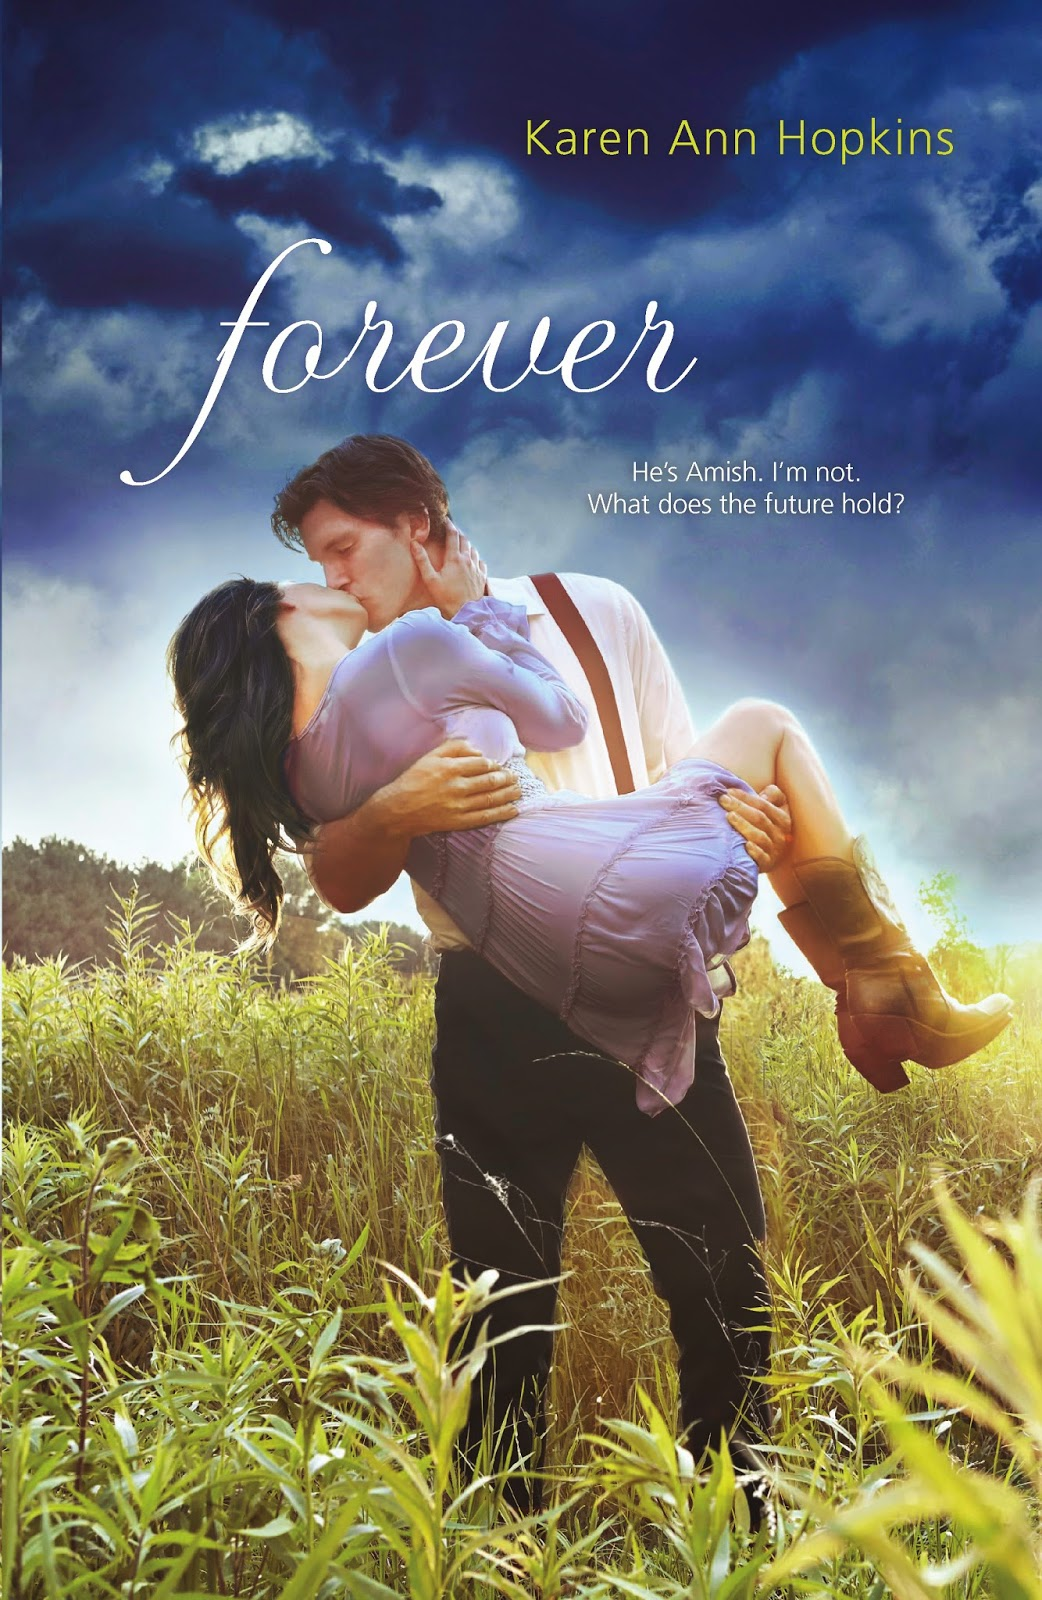 http://actinupwithbooks.blogspot.com/2014/01/review-forever-by-karen-ann-hopkins.html